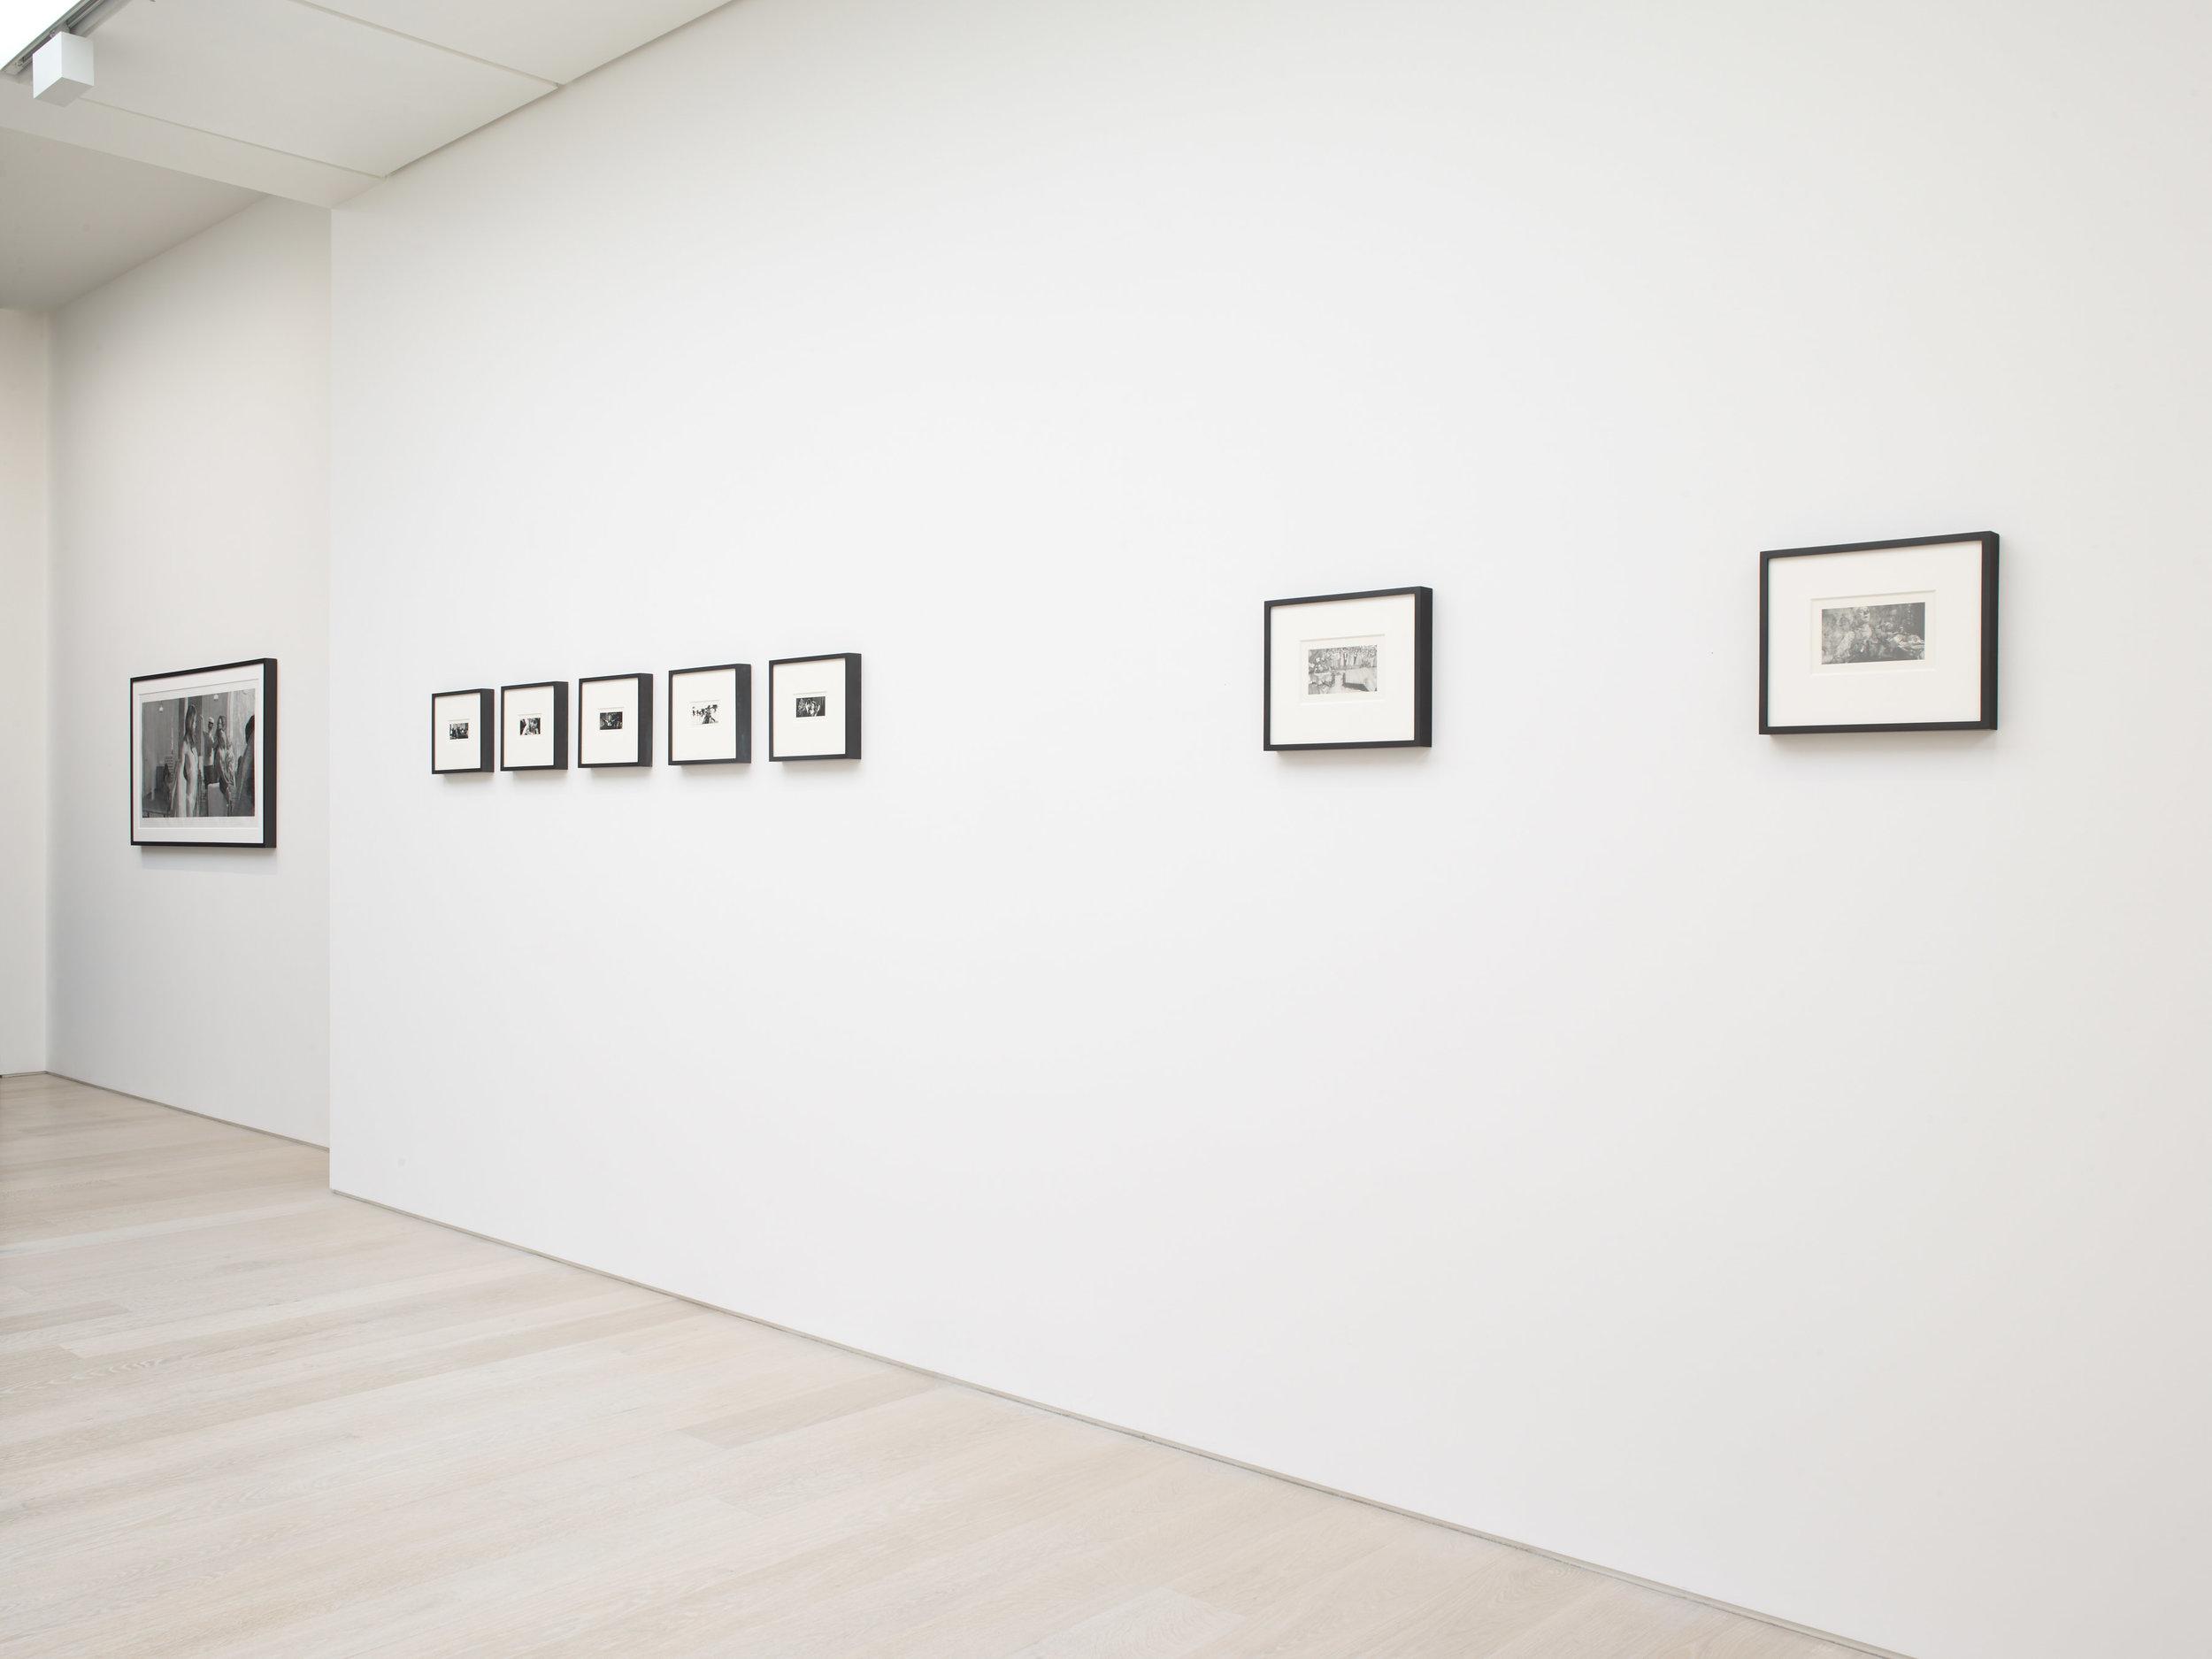 Marie Harnett_Still_Alan Cristea Gallery 2017 installation. Photo Stephe...-4.jpg